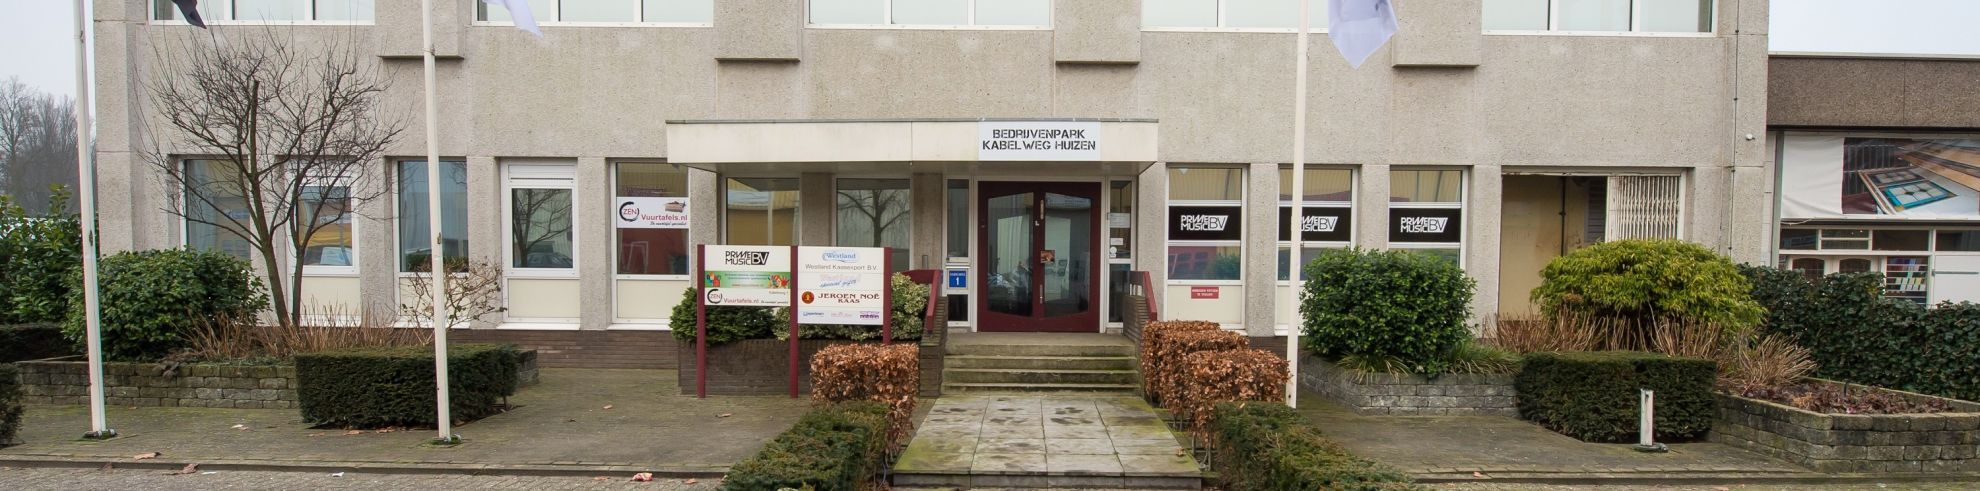 Bedrijvenpark Kabelweg Huizen Hoofdingang Entree